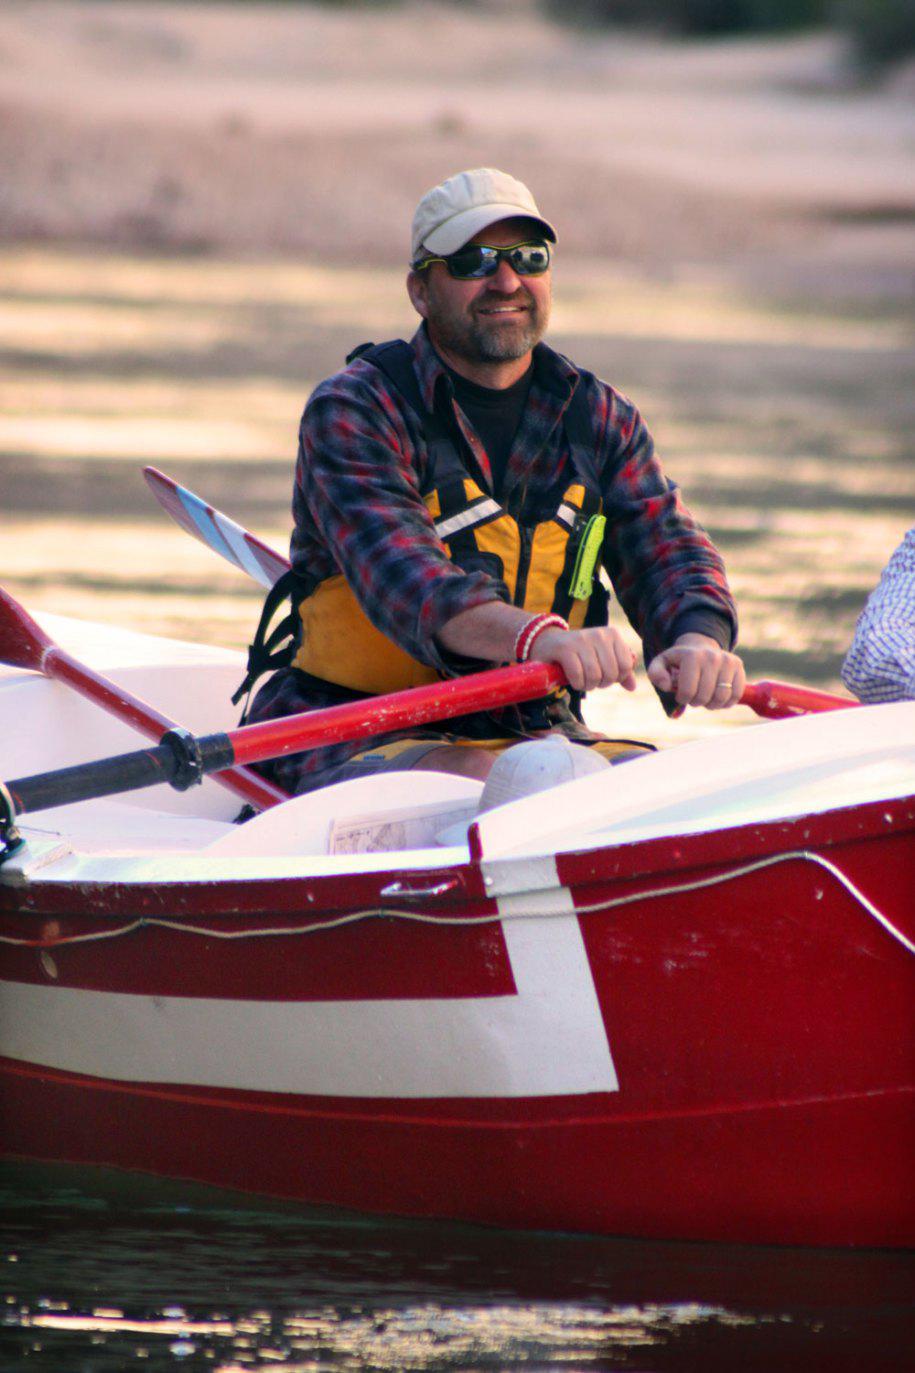 Greg hatten in his wooden boat